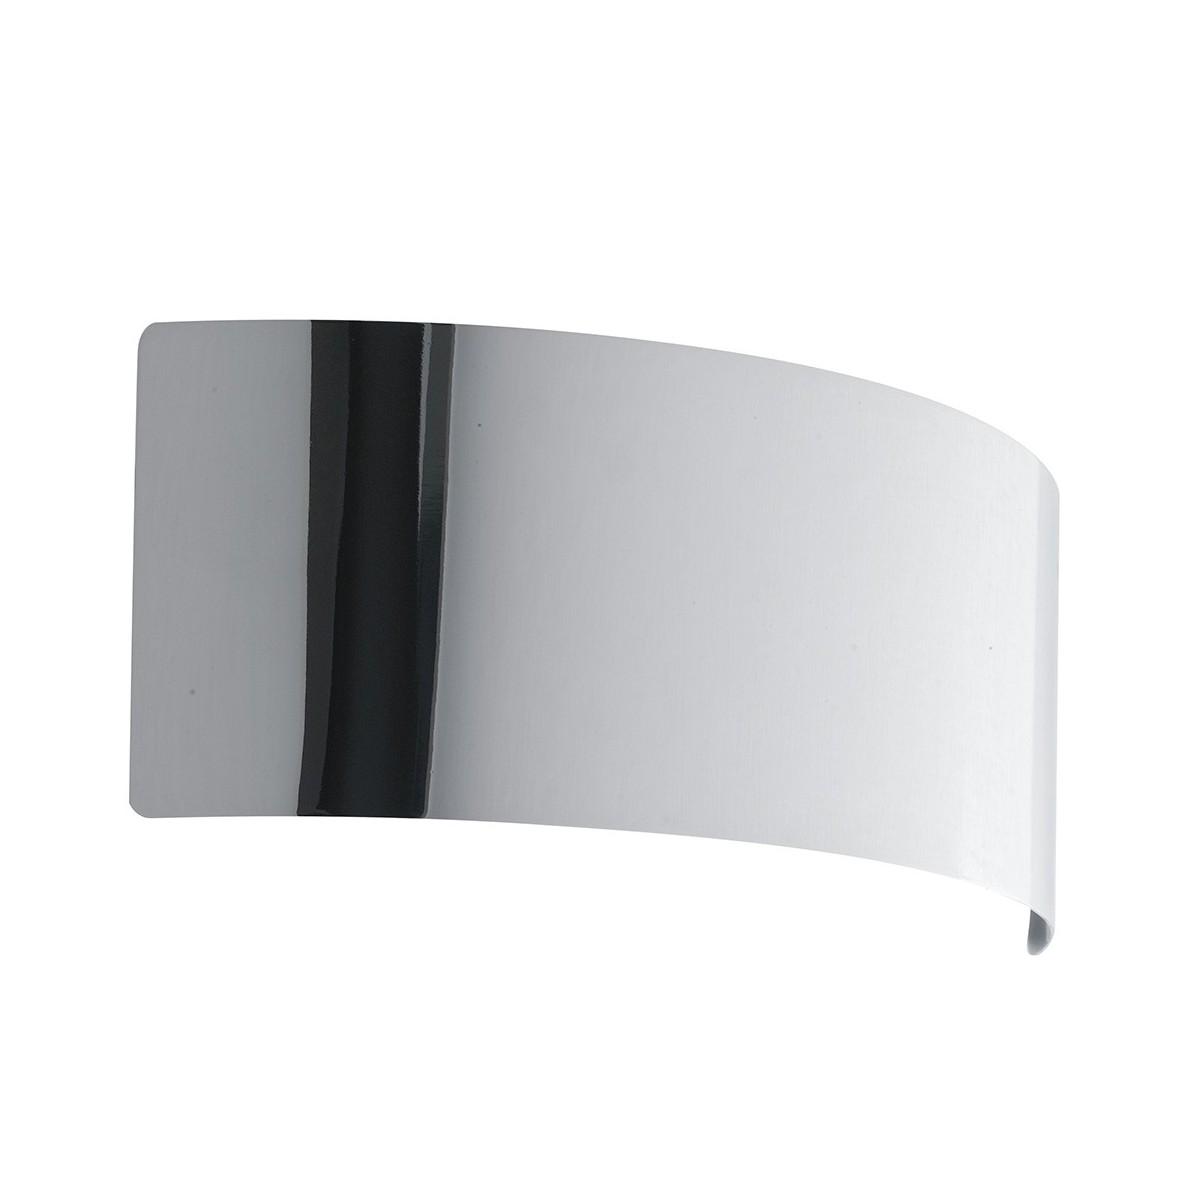 LED-DYNAMIC-AP23 CR - Applique Arcuata Metallo finitura Cromata Lampada Moderna Led 6 watt Luce Naturale